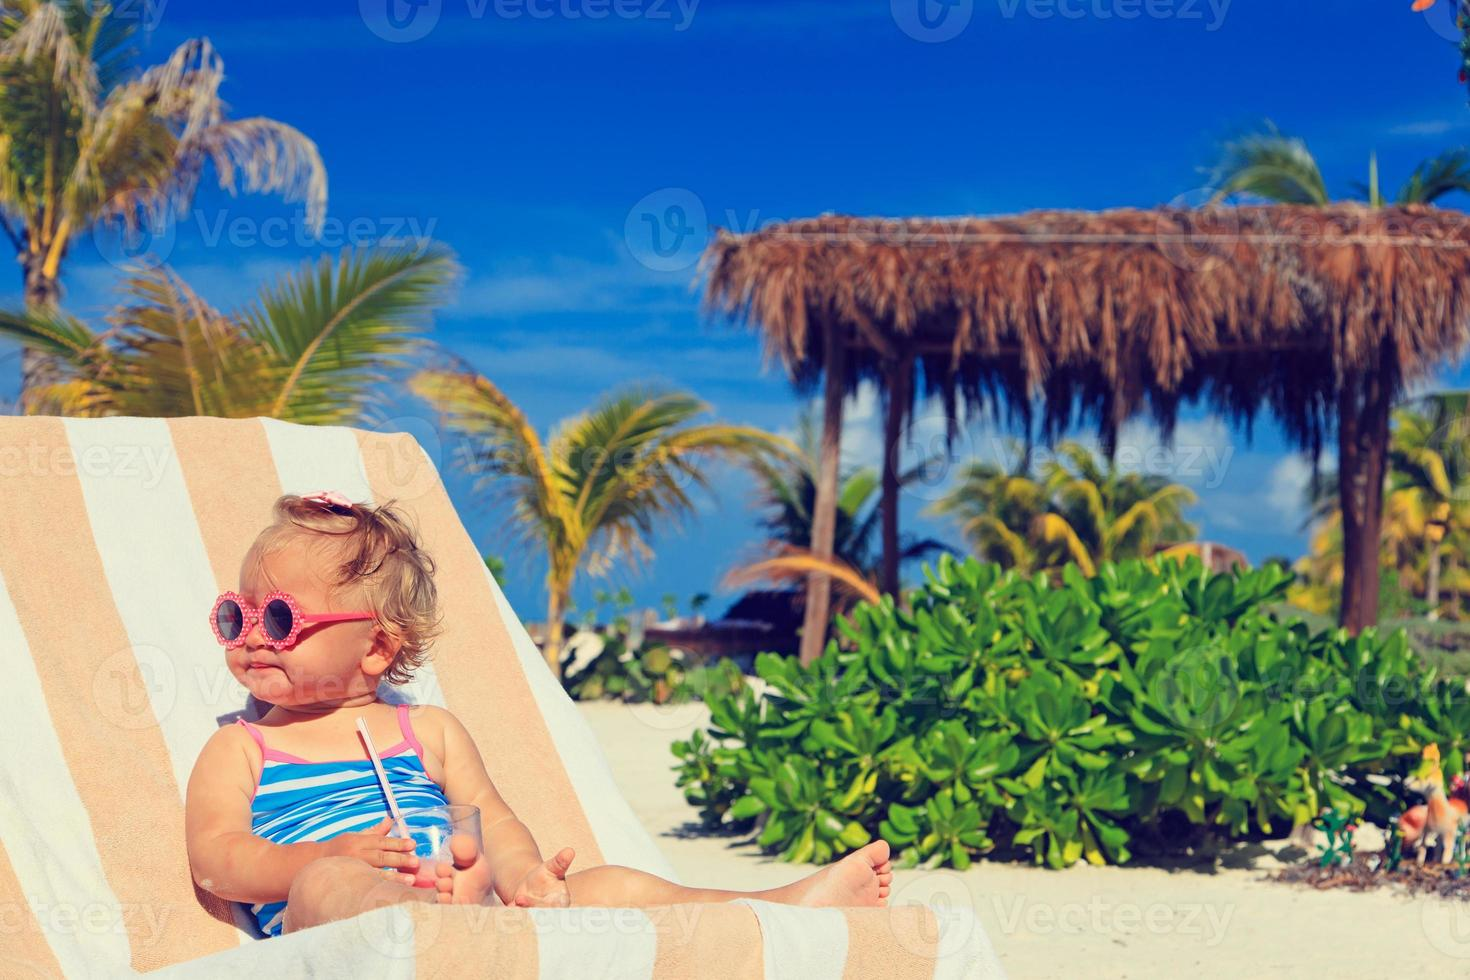 niña linda bebiendo jugo en playa tropical foto